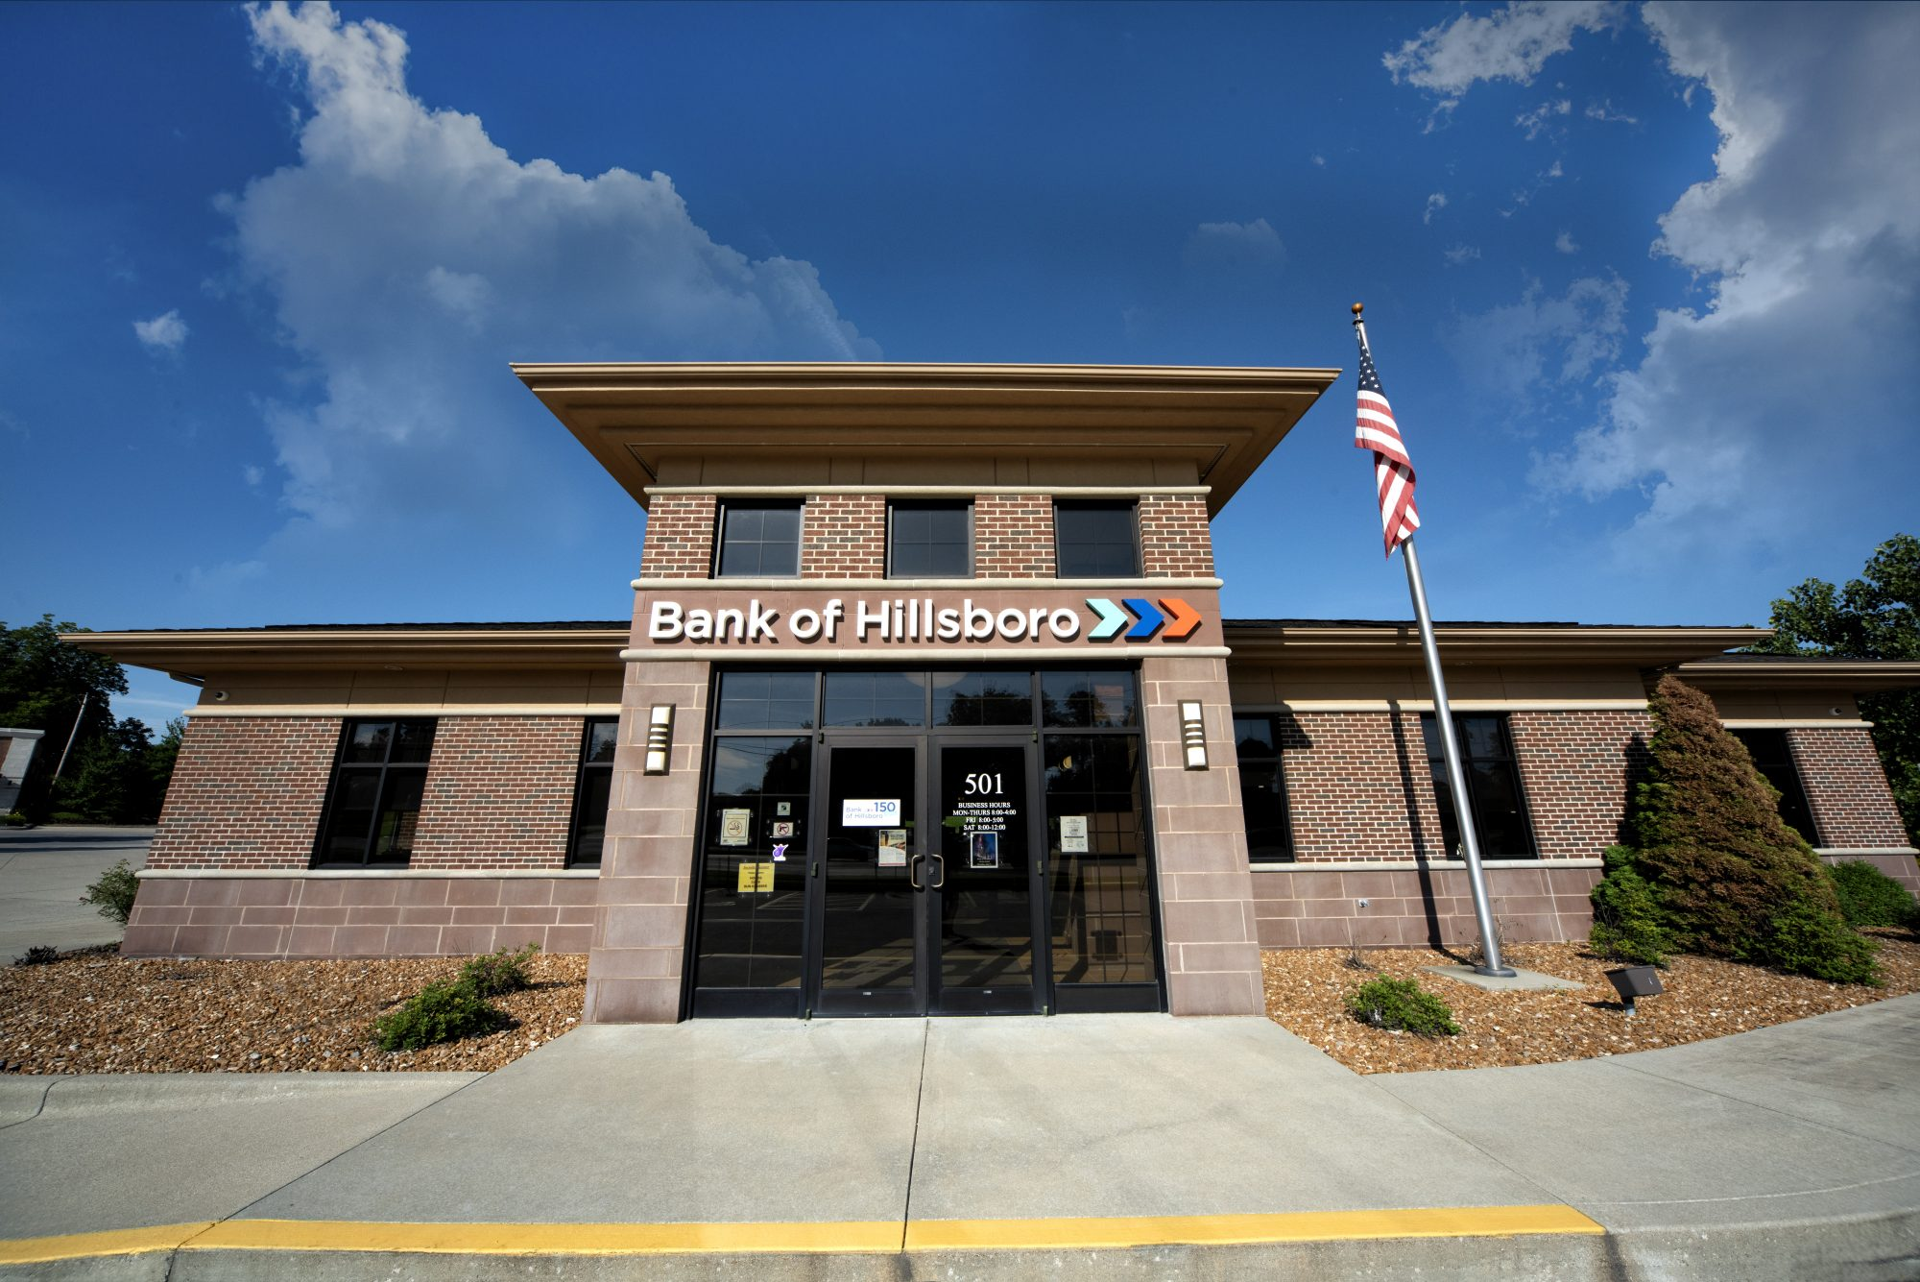 Bank of Hillsboro